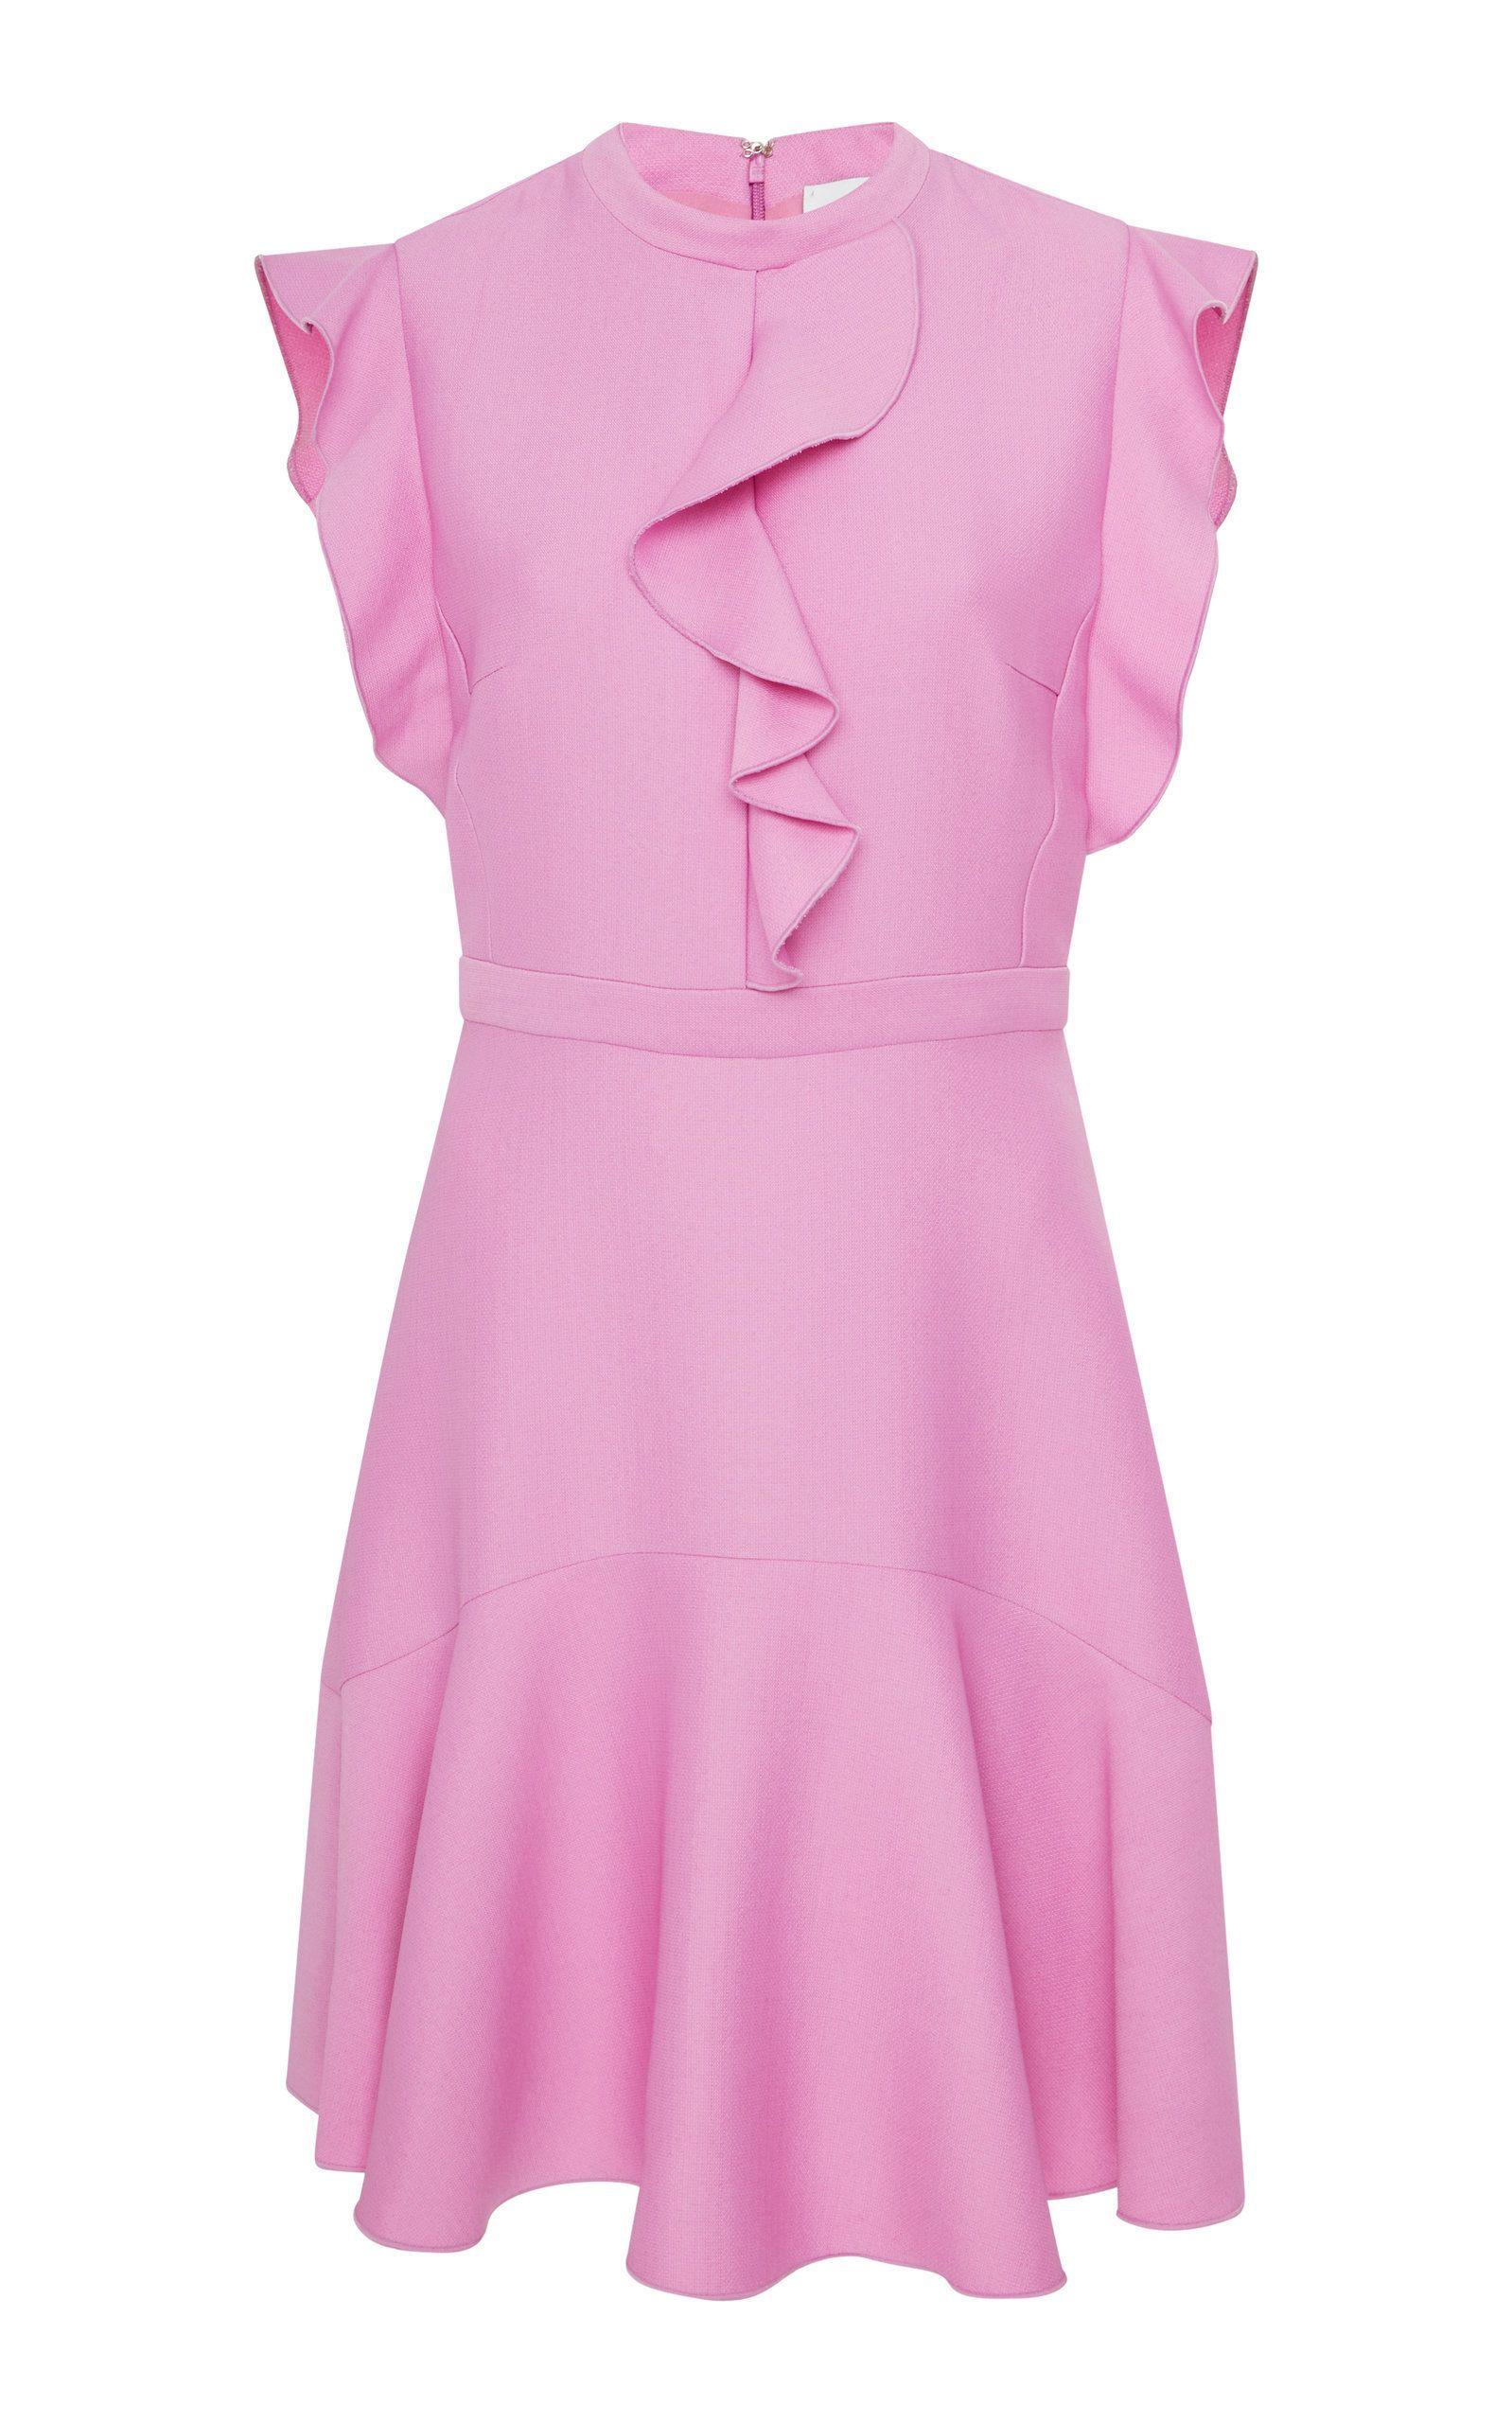 Ruffle mini dress in moraa pinterest dresses